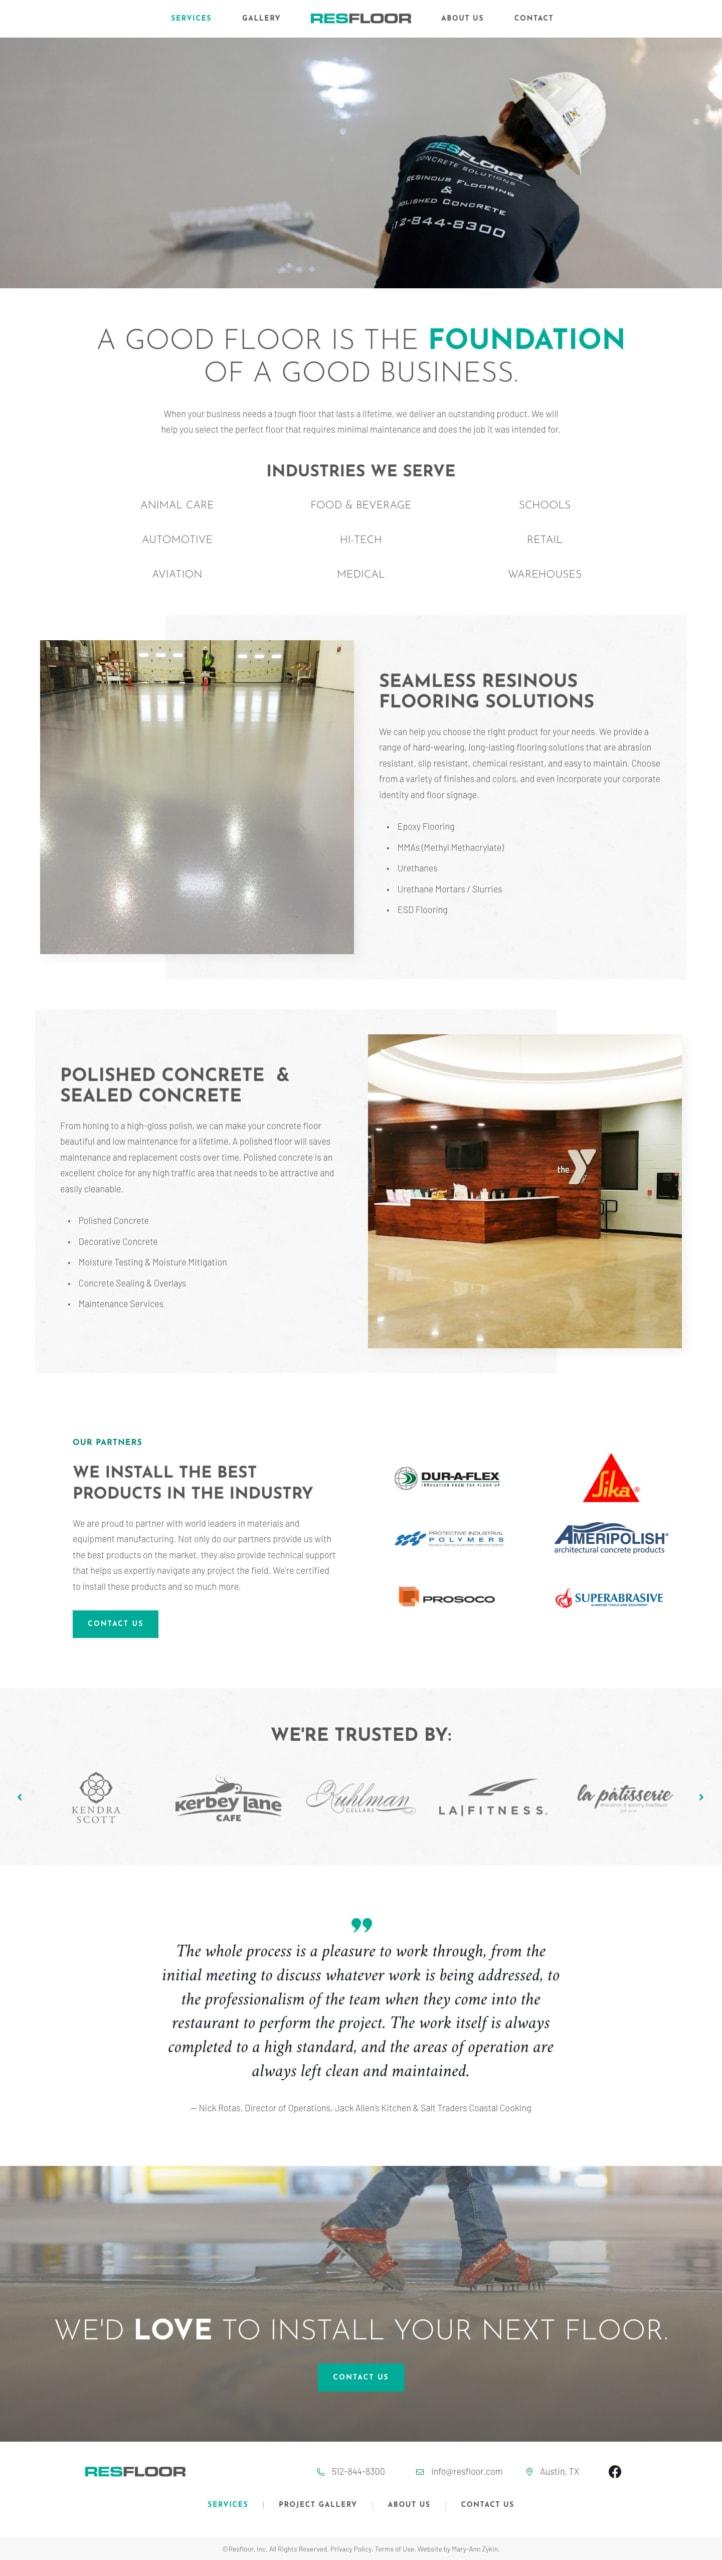 Resfloor Services Page